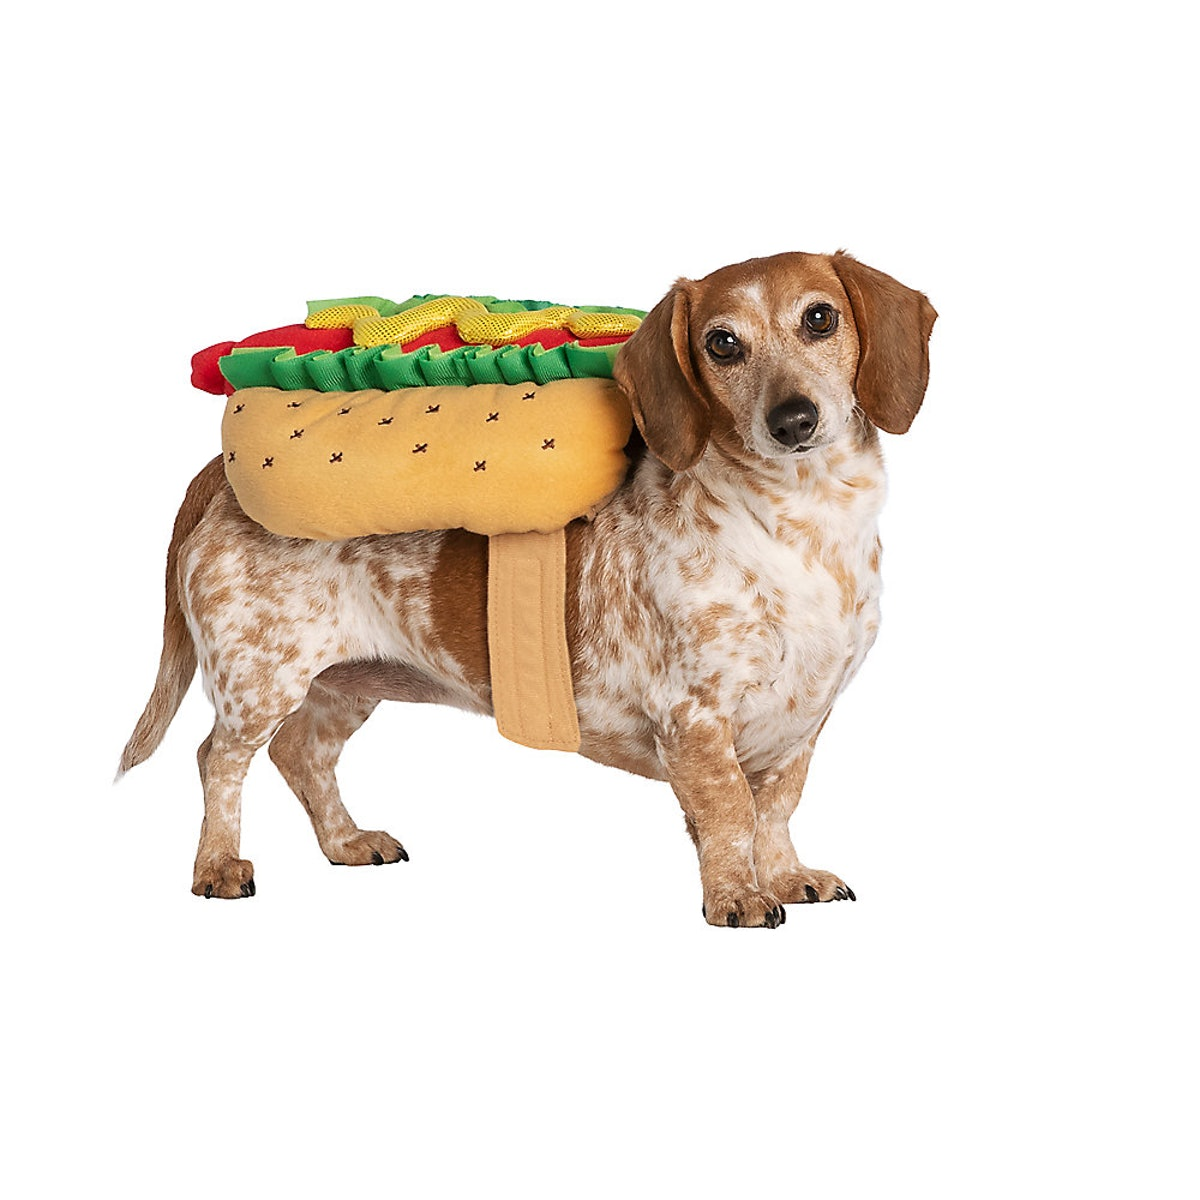 Thrills & Chills Halloween Hot Dog Cat & Dog Costume